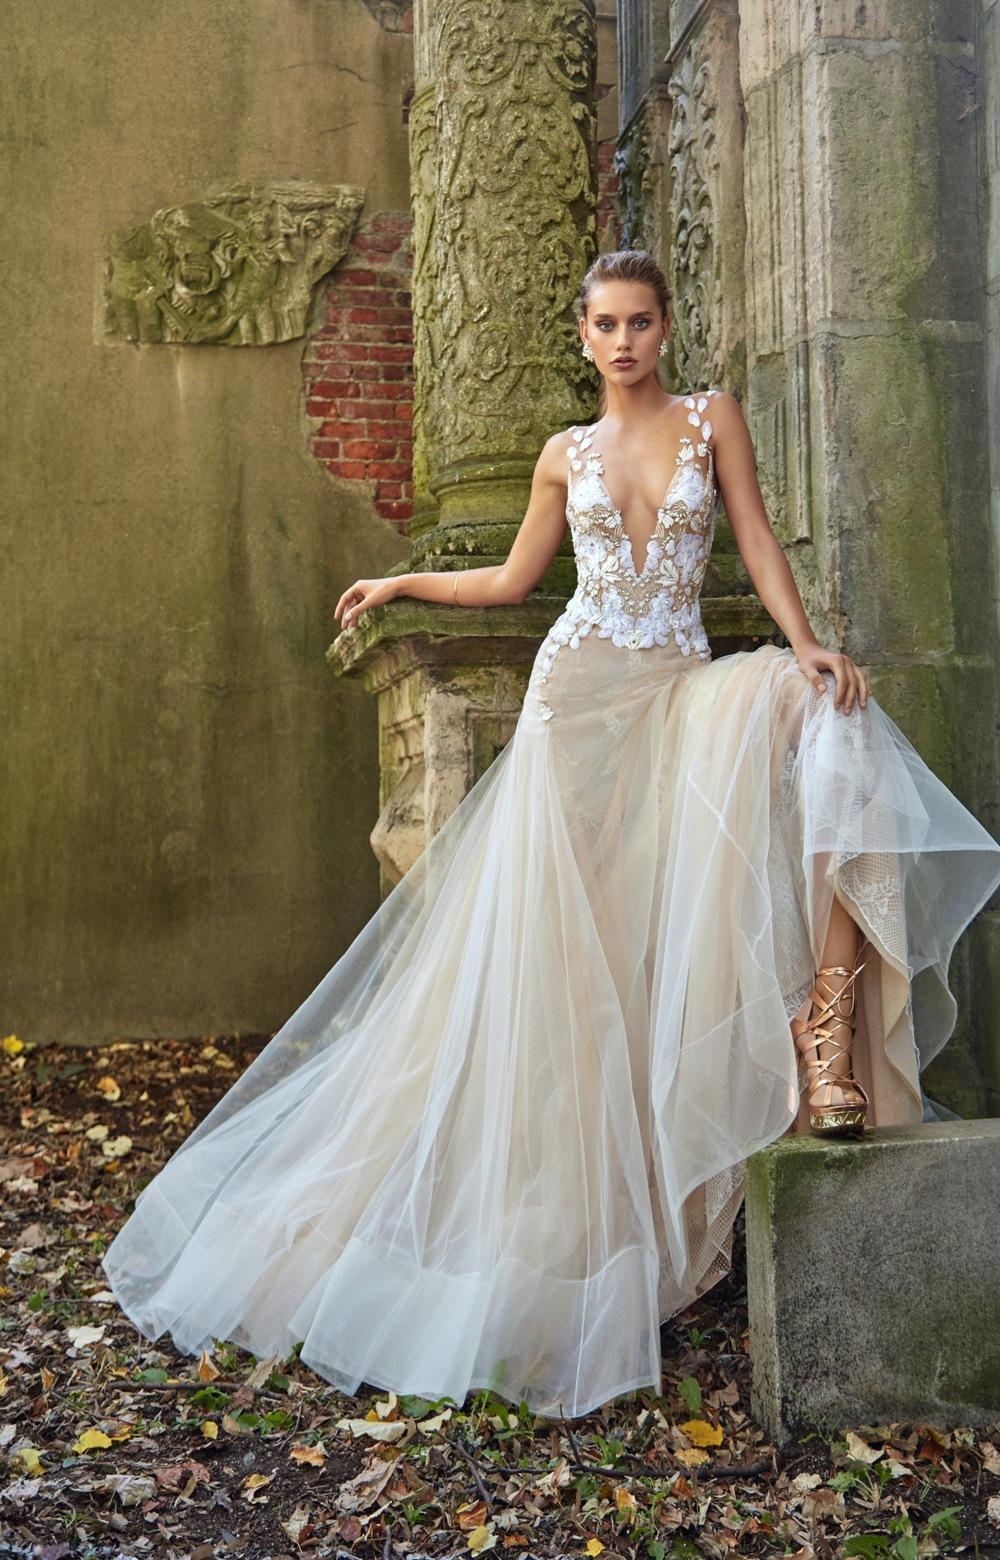 Brautkleid von Galia Lahav mit Tüllrock